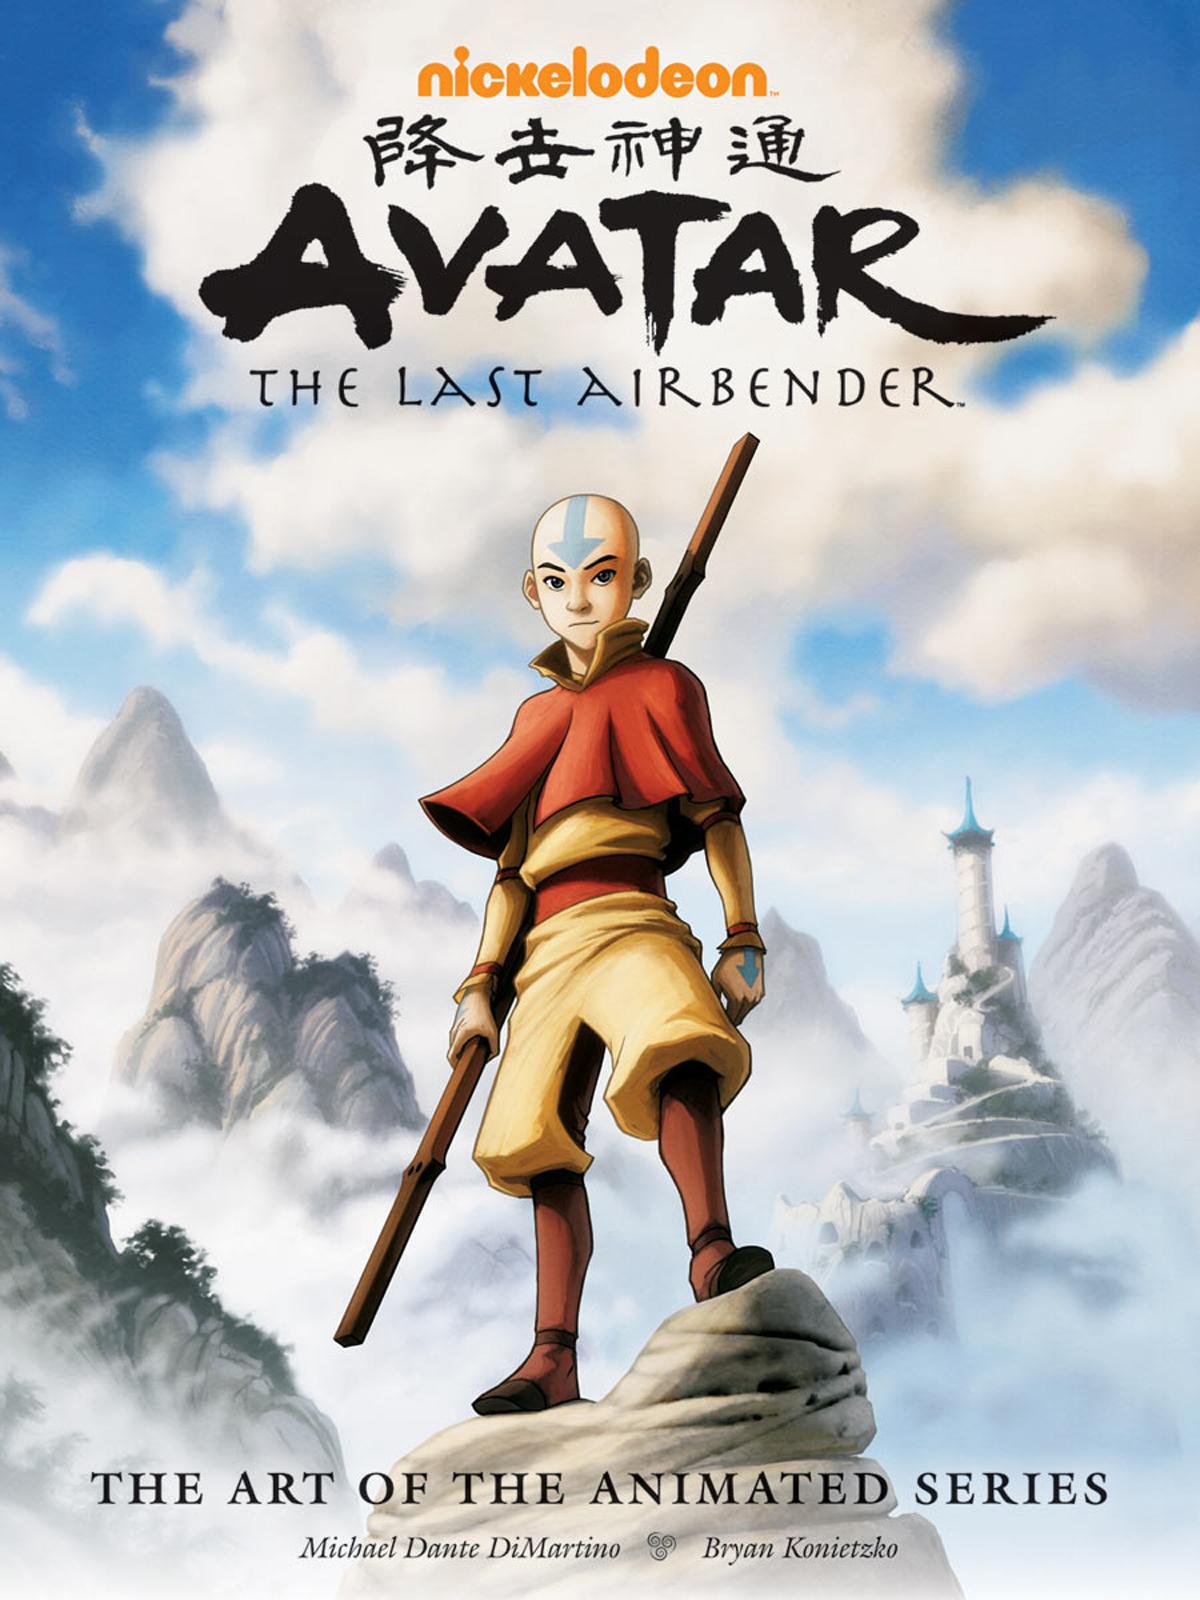 Avatar The Last Airbender Serie 2005 Adorocinema